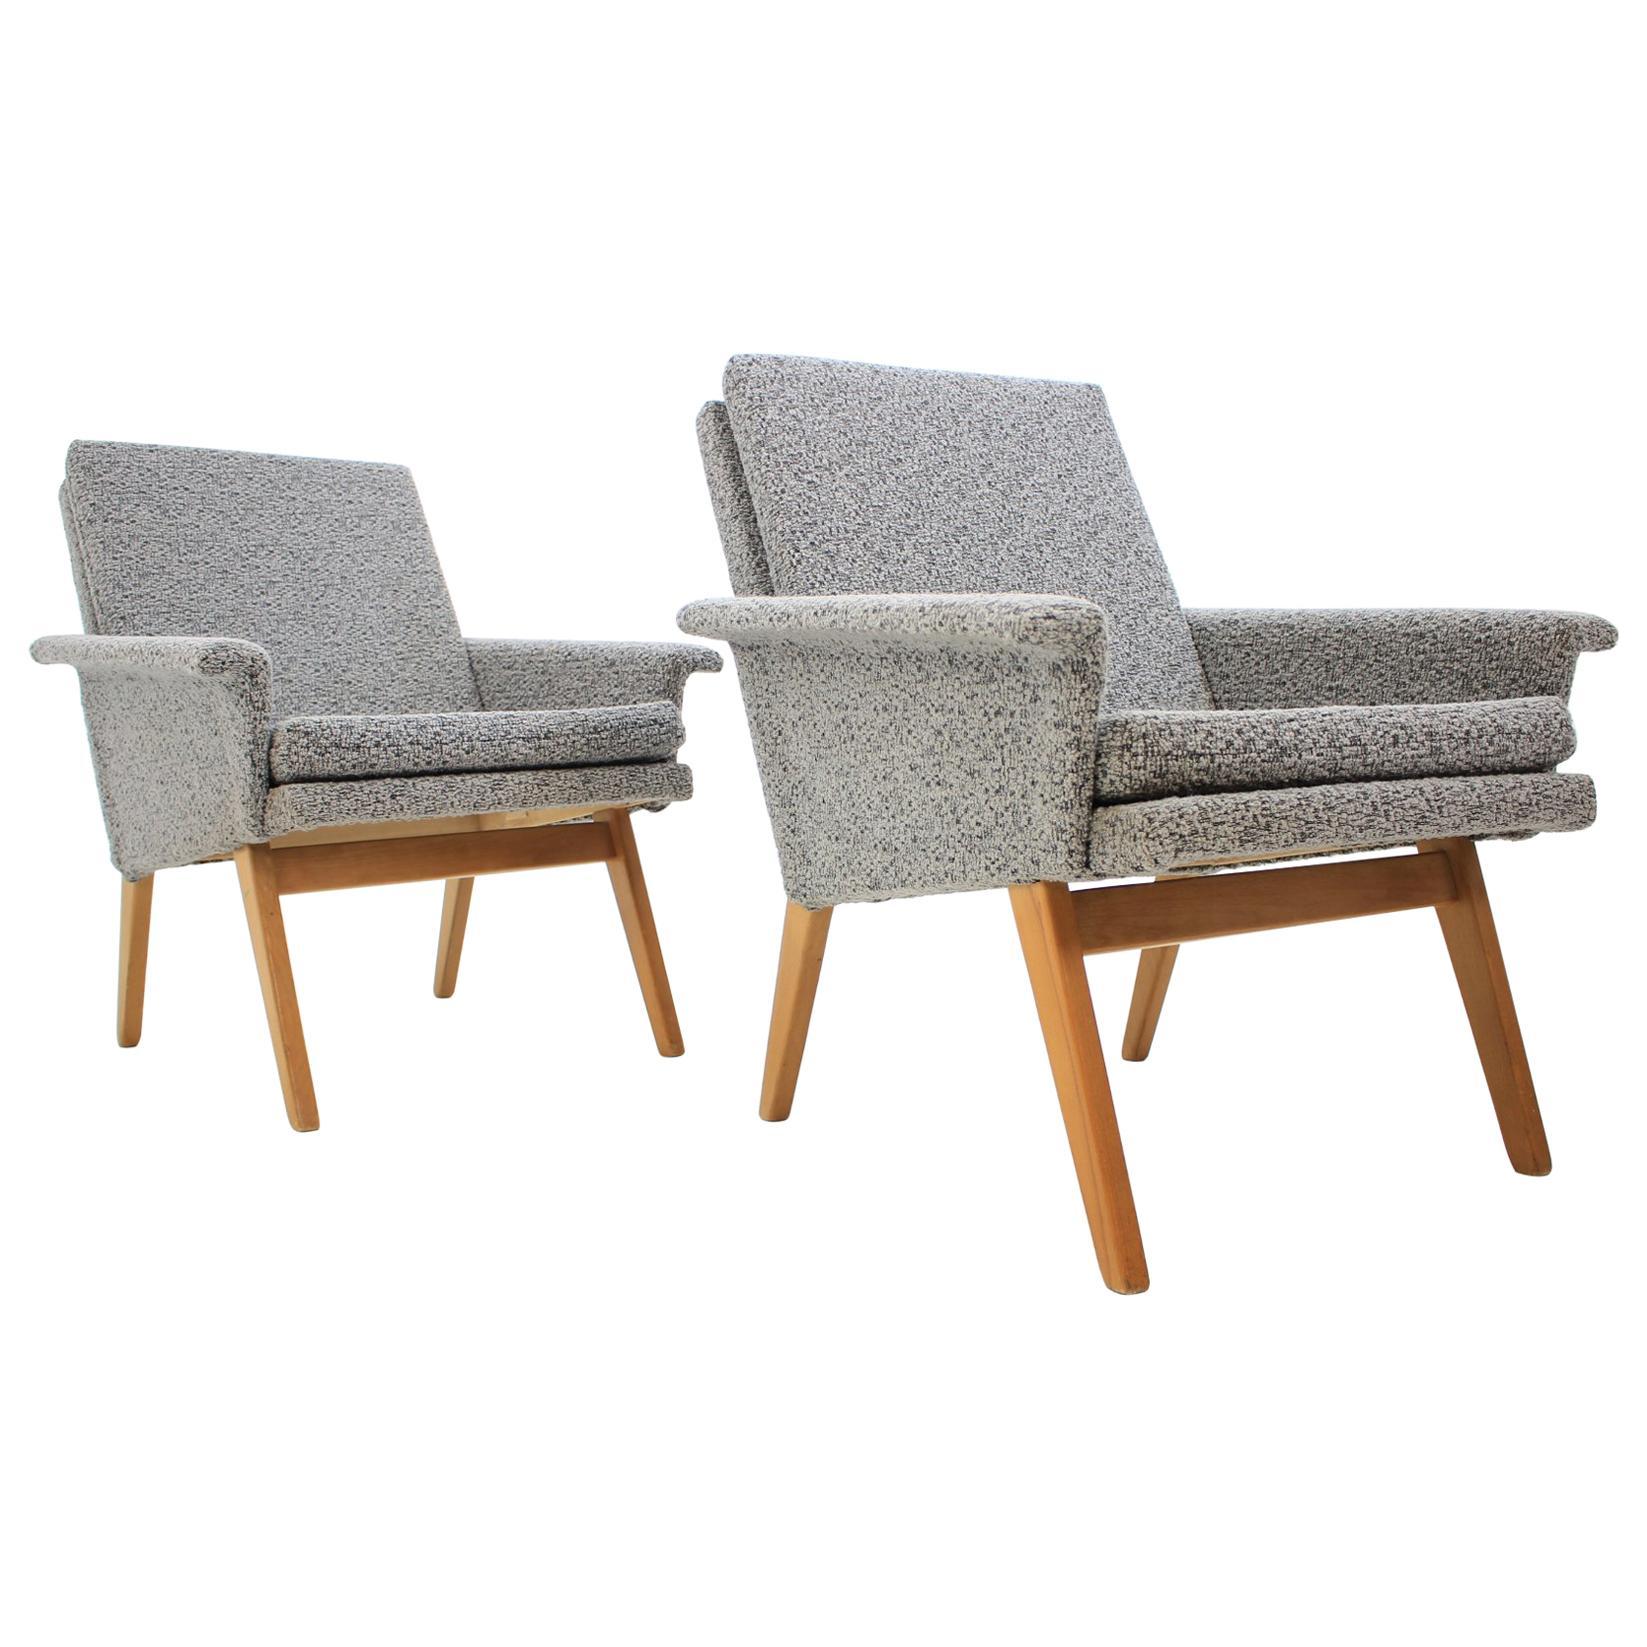 Pair of Midcentury Chairs, Denmark, 1970s